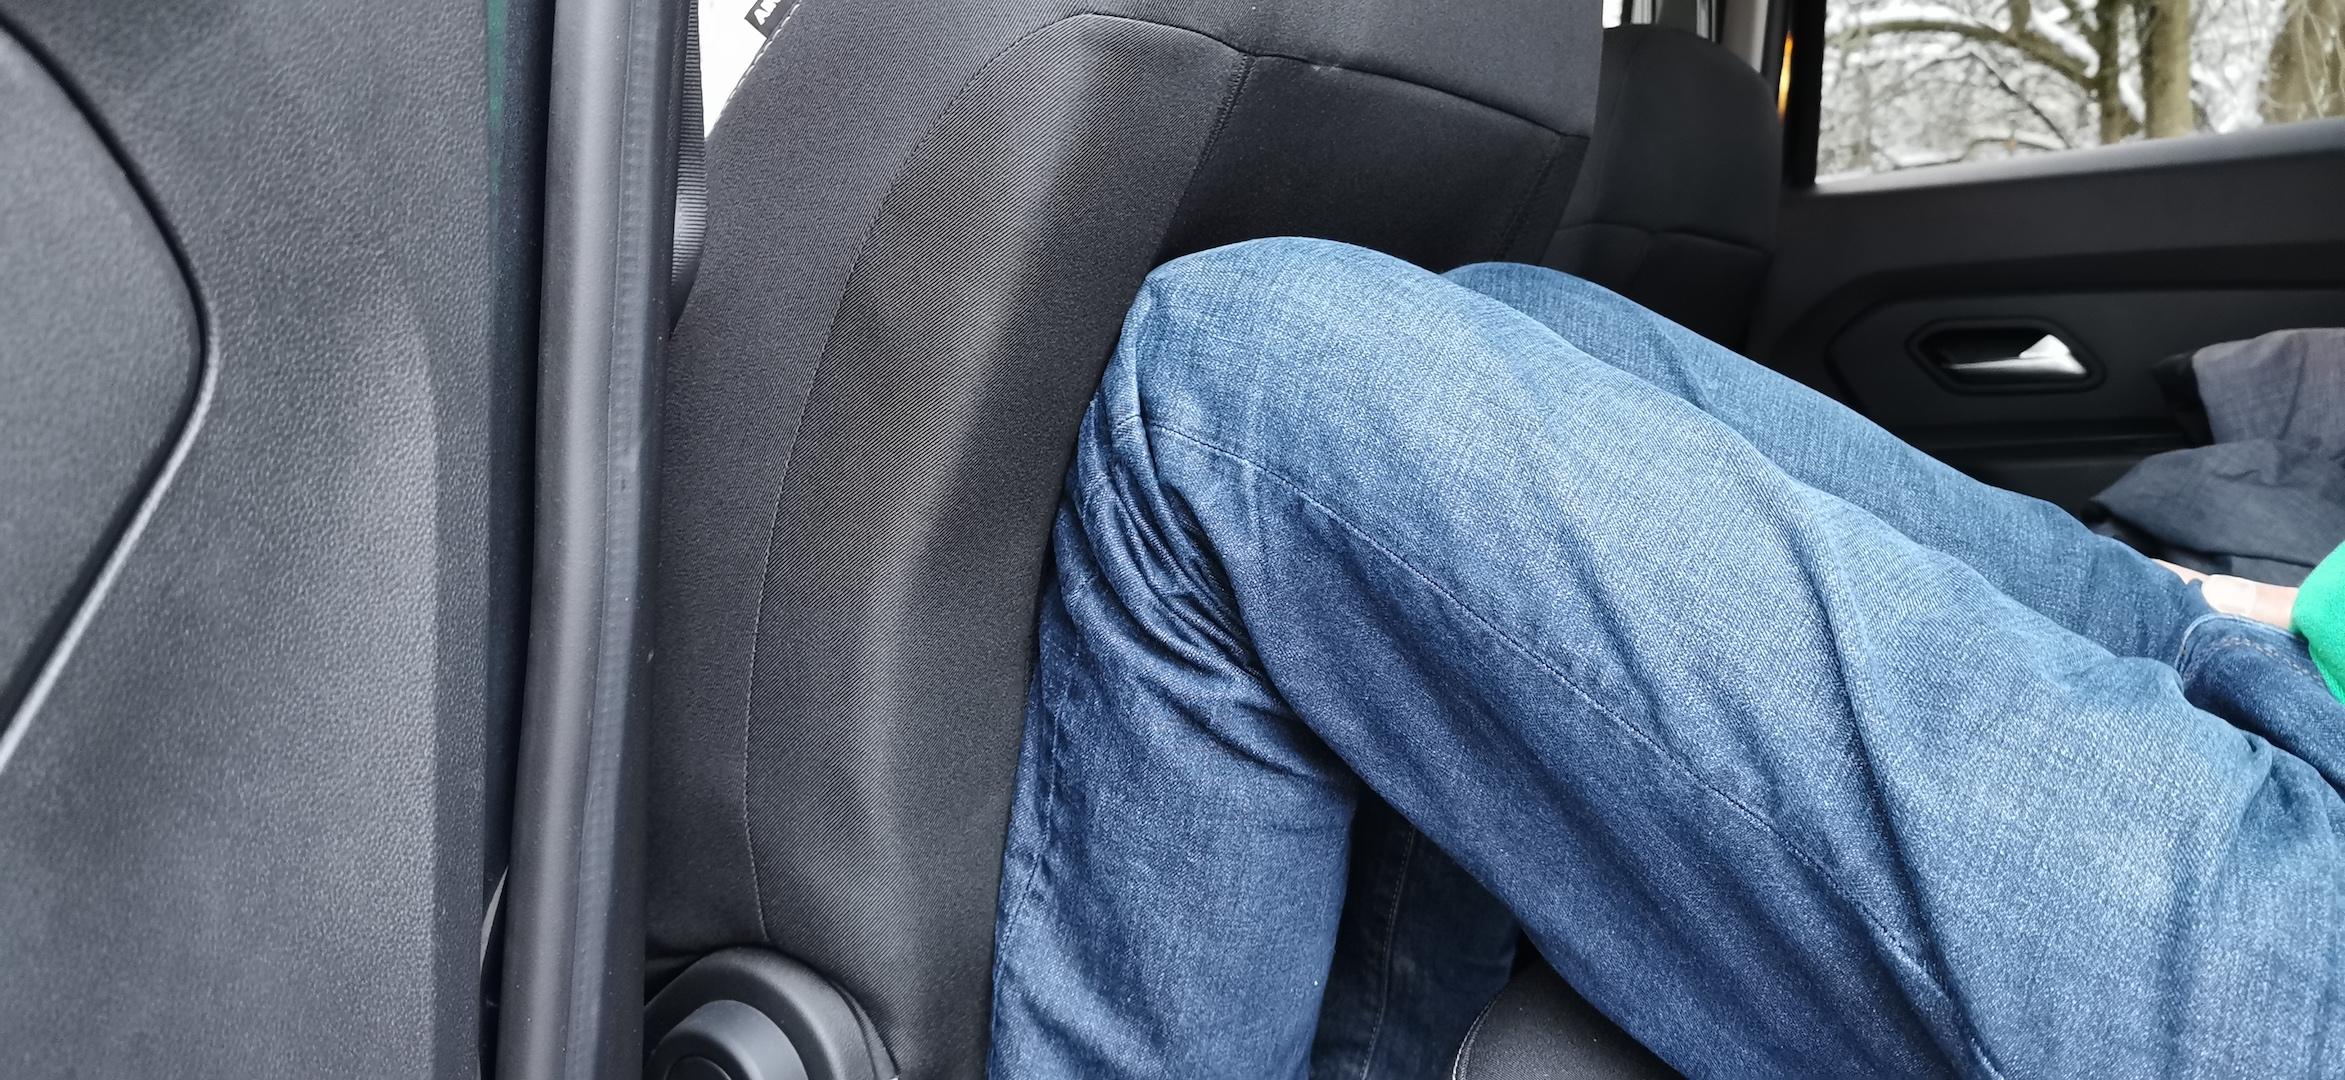 Dacia Duster TCe 100 LPG - prostor vzadu